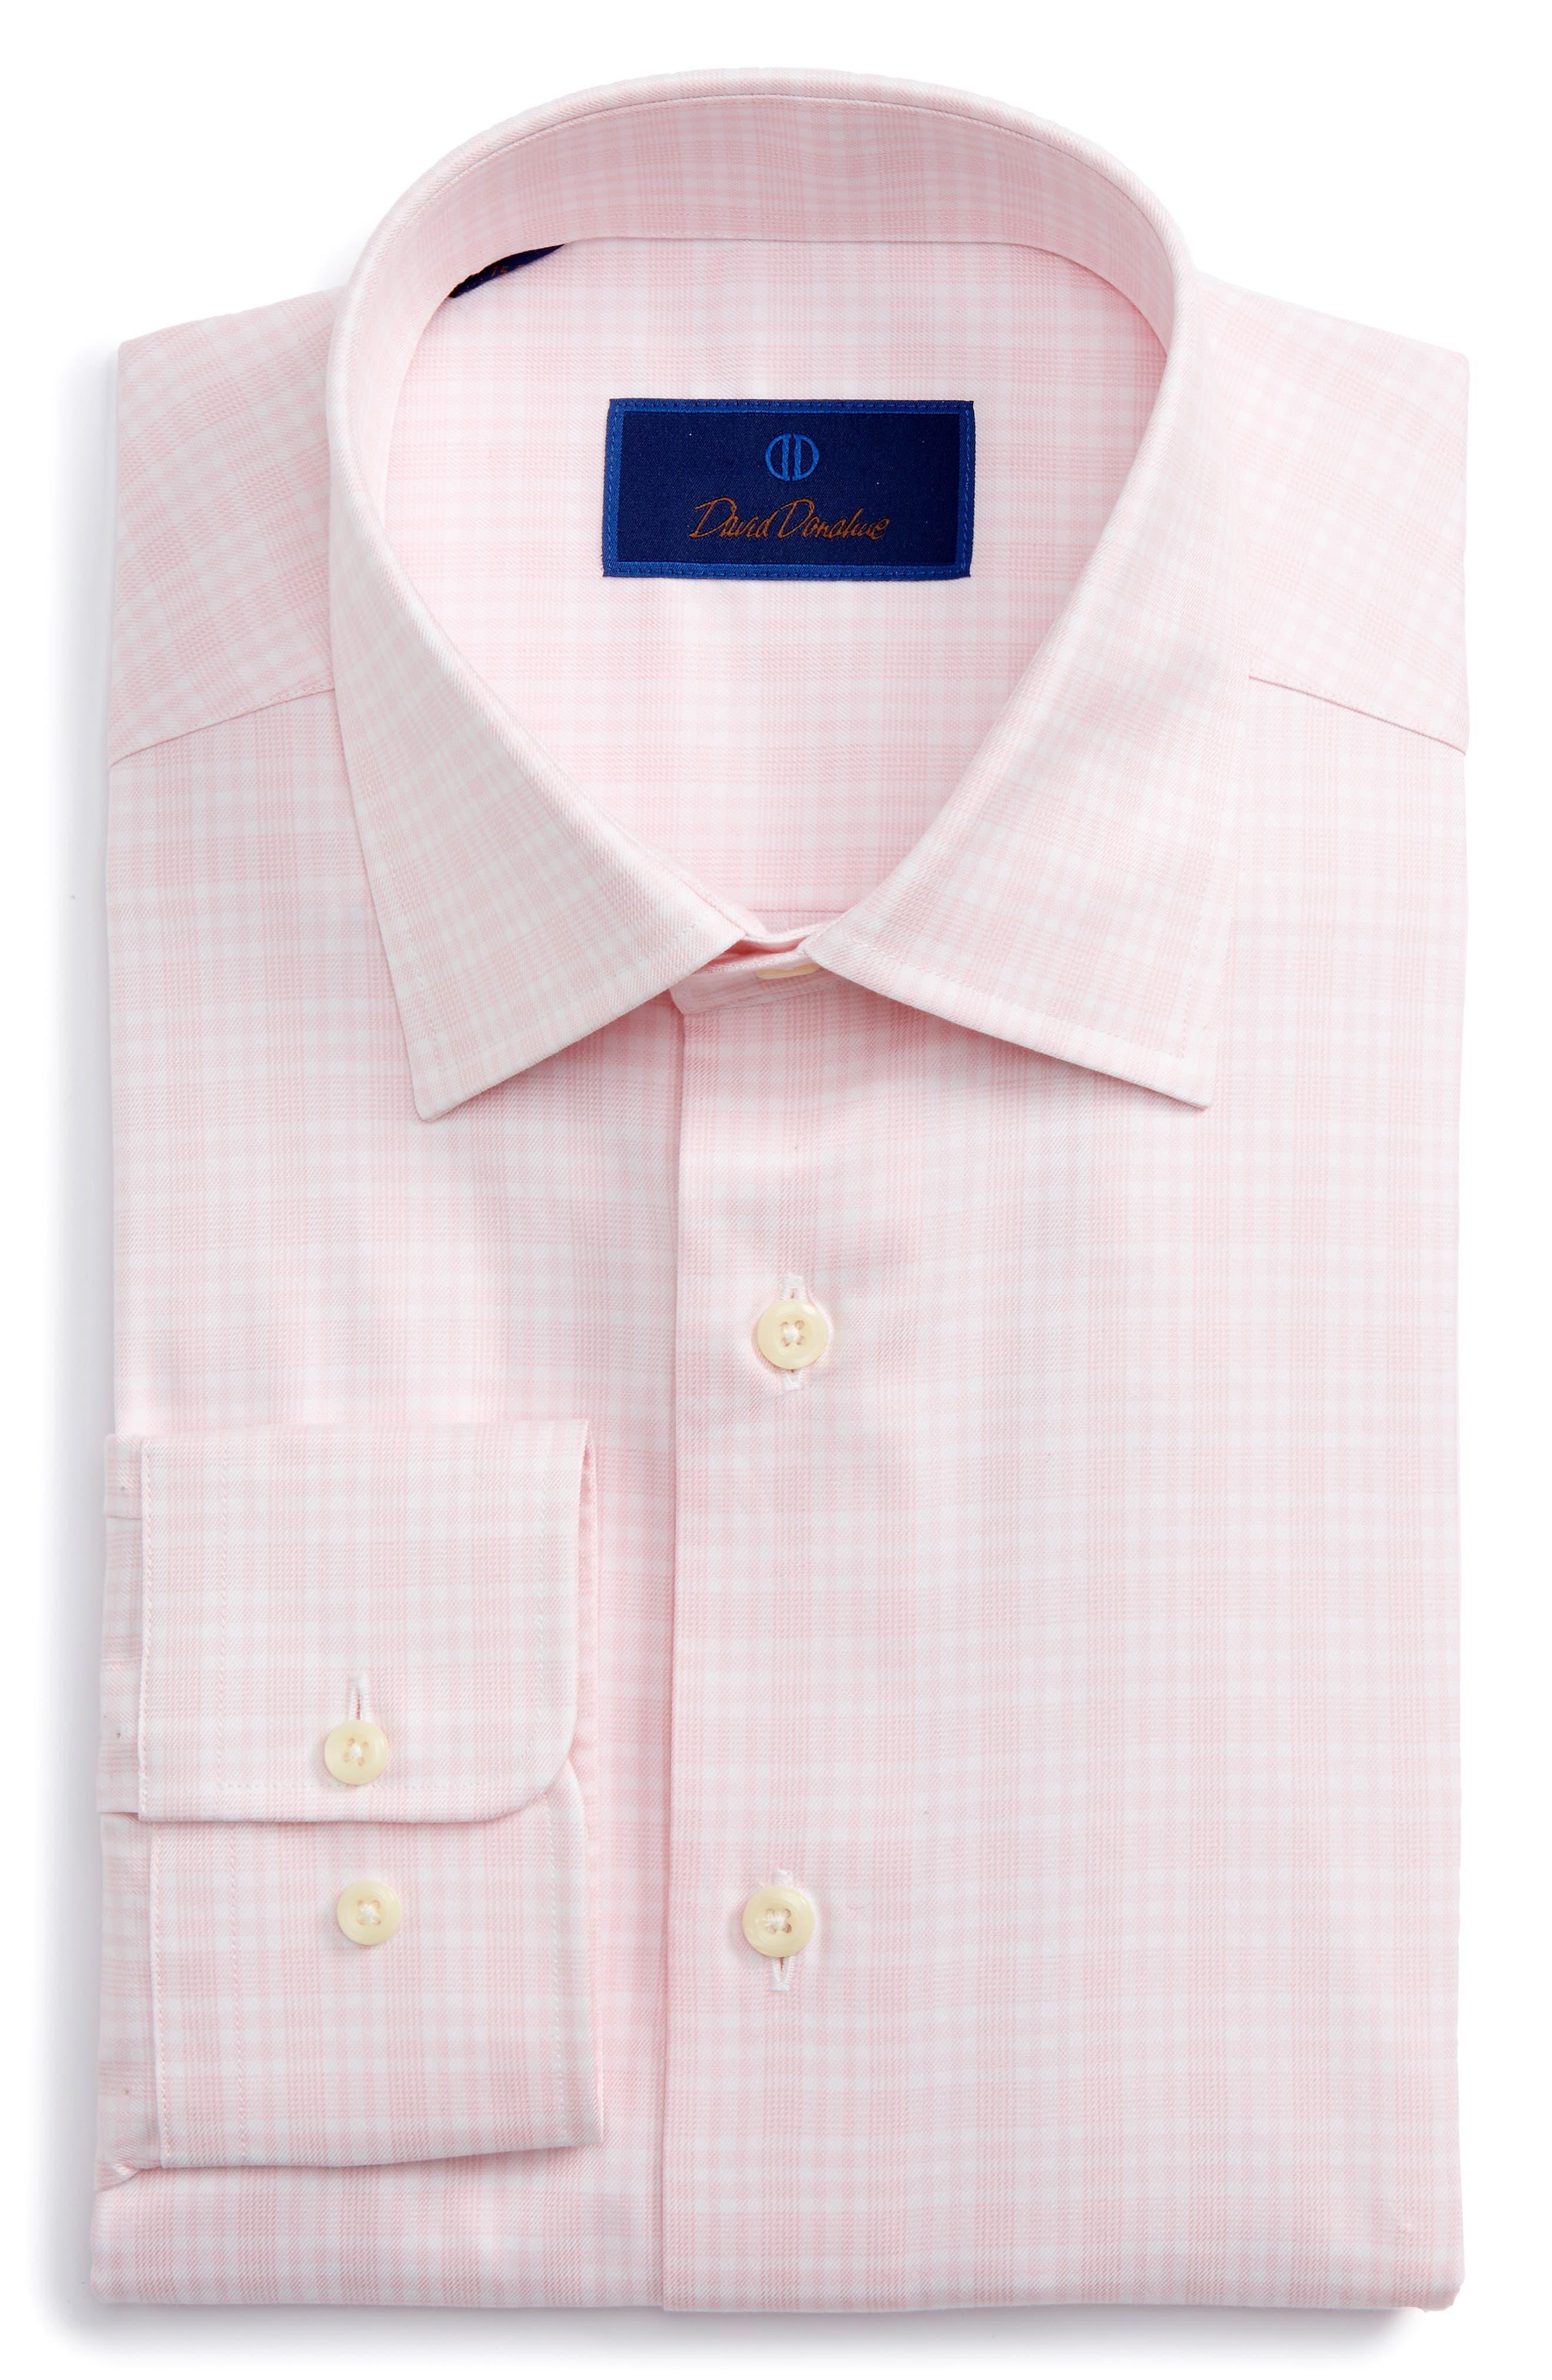 Regular Fit Plaid Dress Shirt,                             Main thumbnail 1, color,                             650